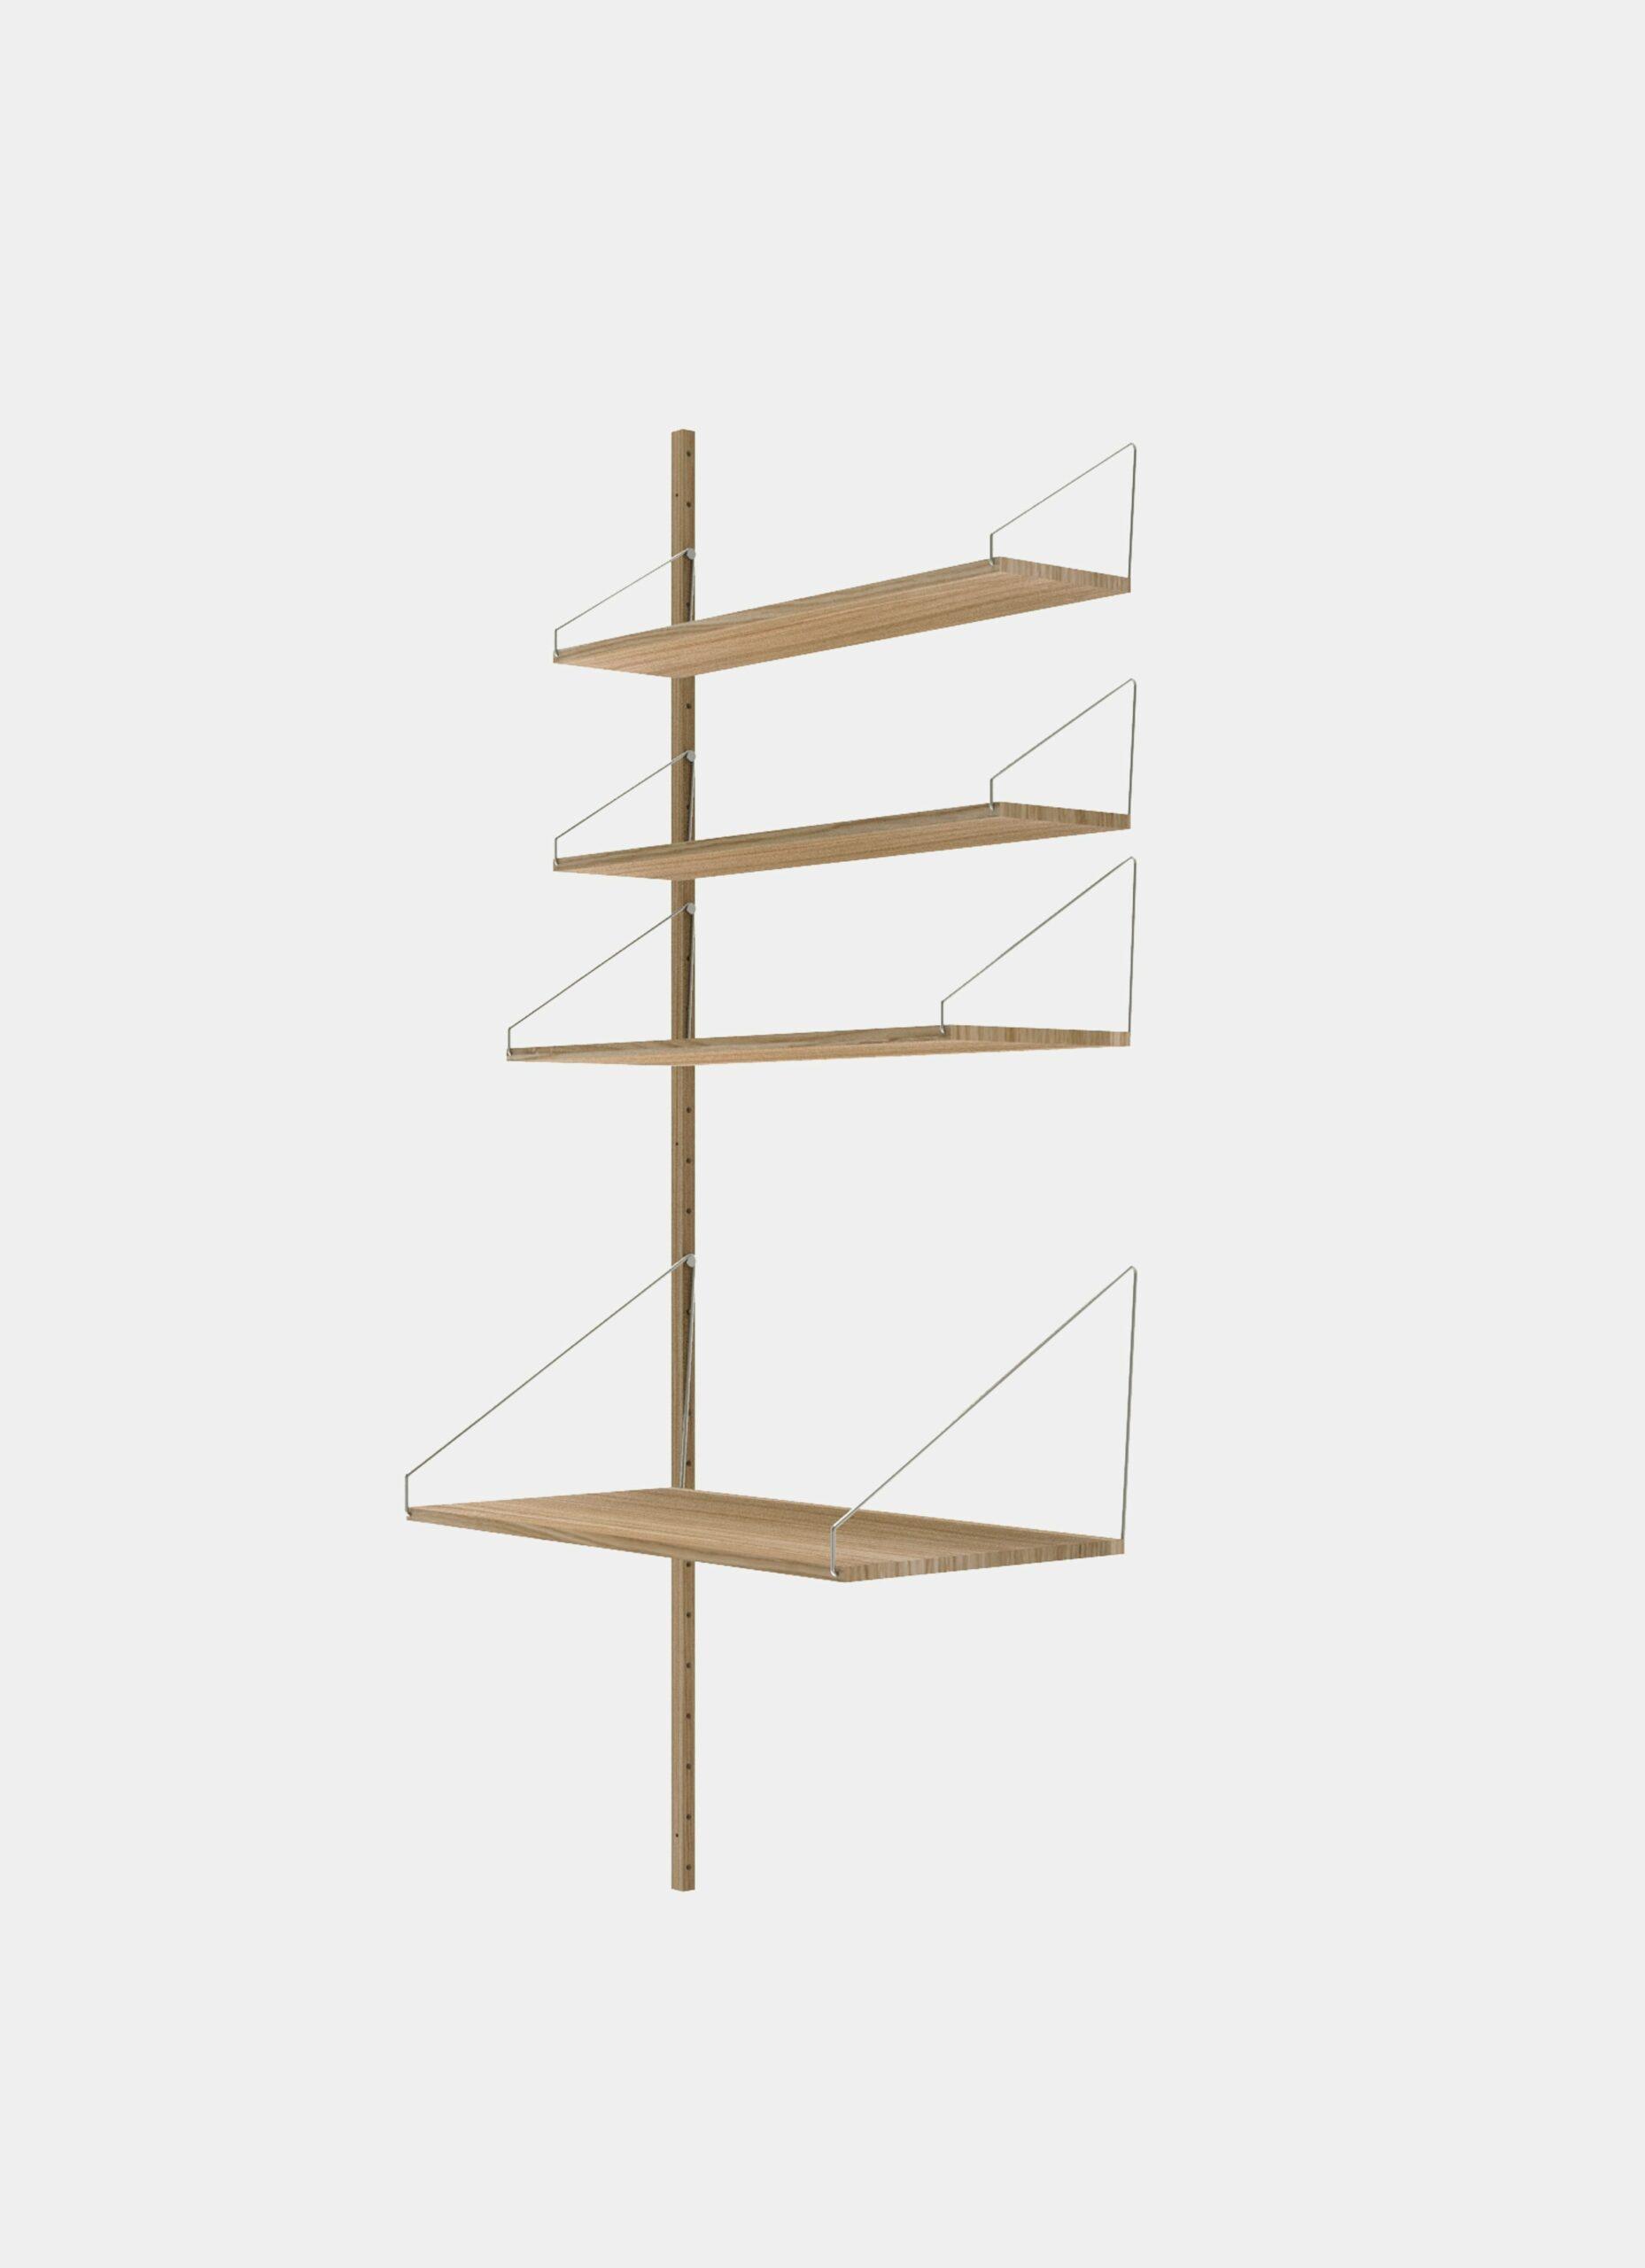 Frama - Shelf Library - Natural - H1852 - Desk Add-on Section